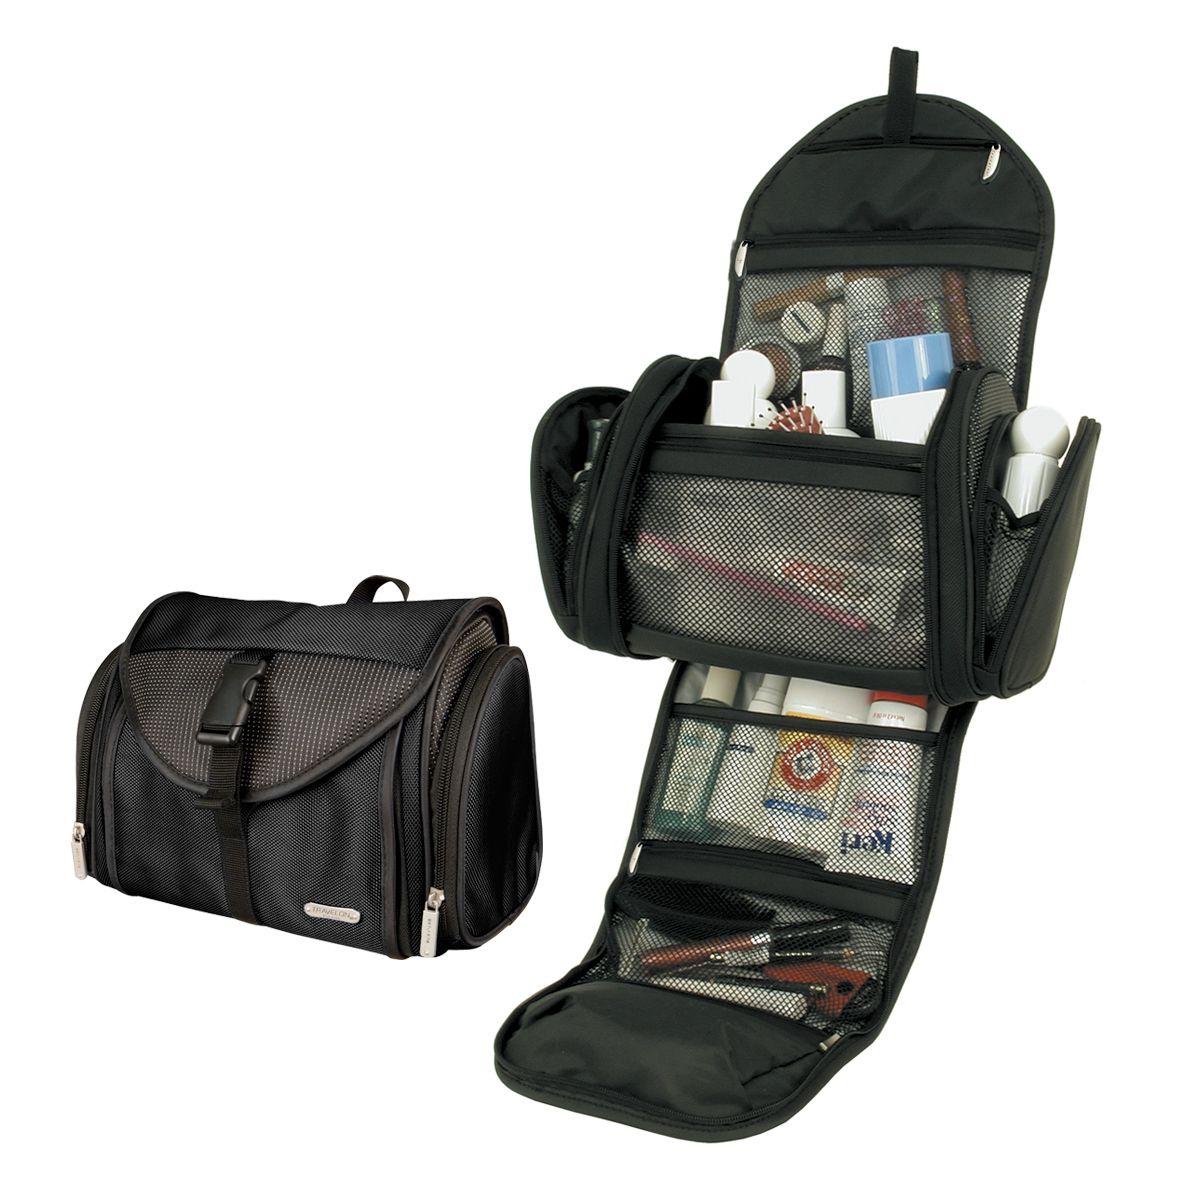 Shop Travelon Airbrush Bag Professional Makeup Cases